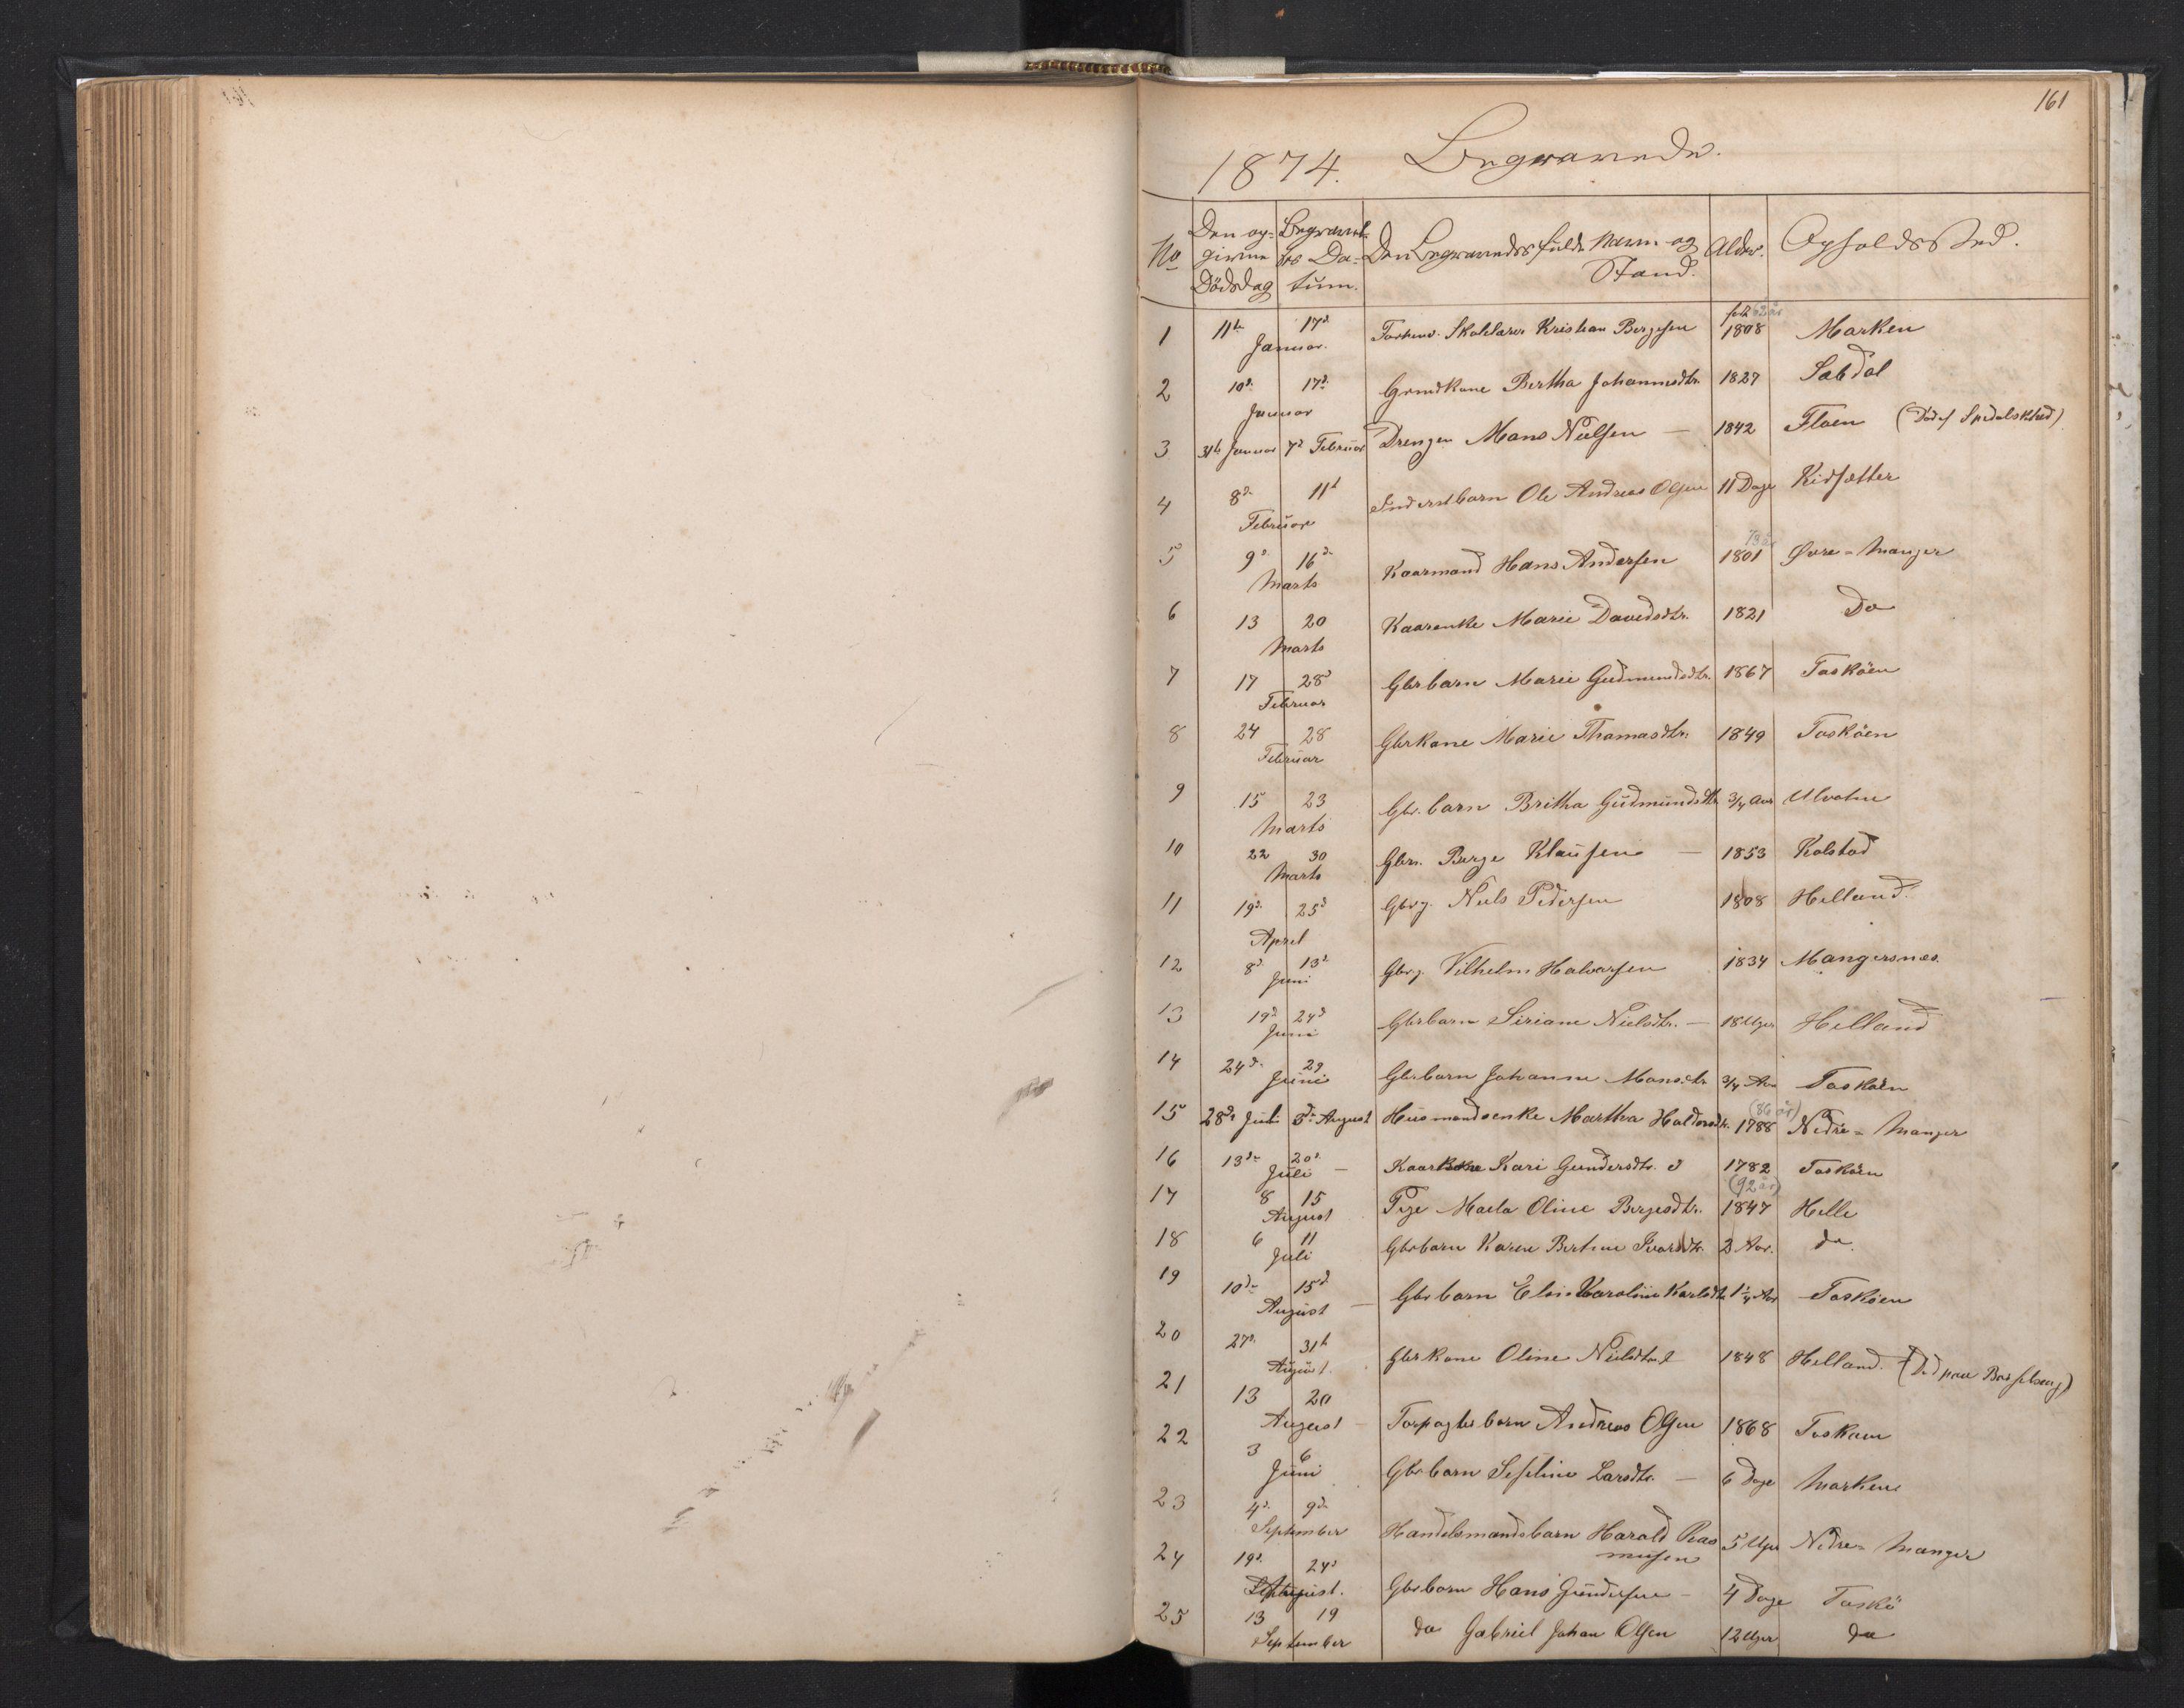 SAB, Manger sokneprestembete, H/Hab: Parish register (copy) no. A 1, 1874-1901, p. 160b-161a